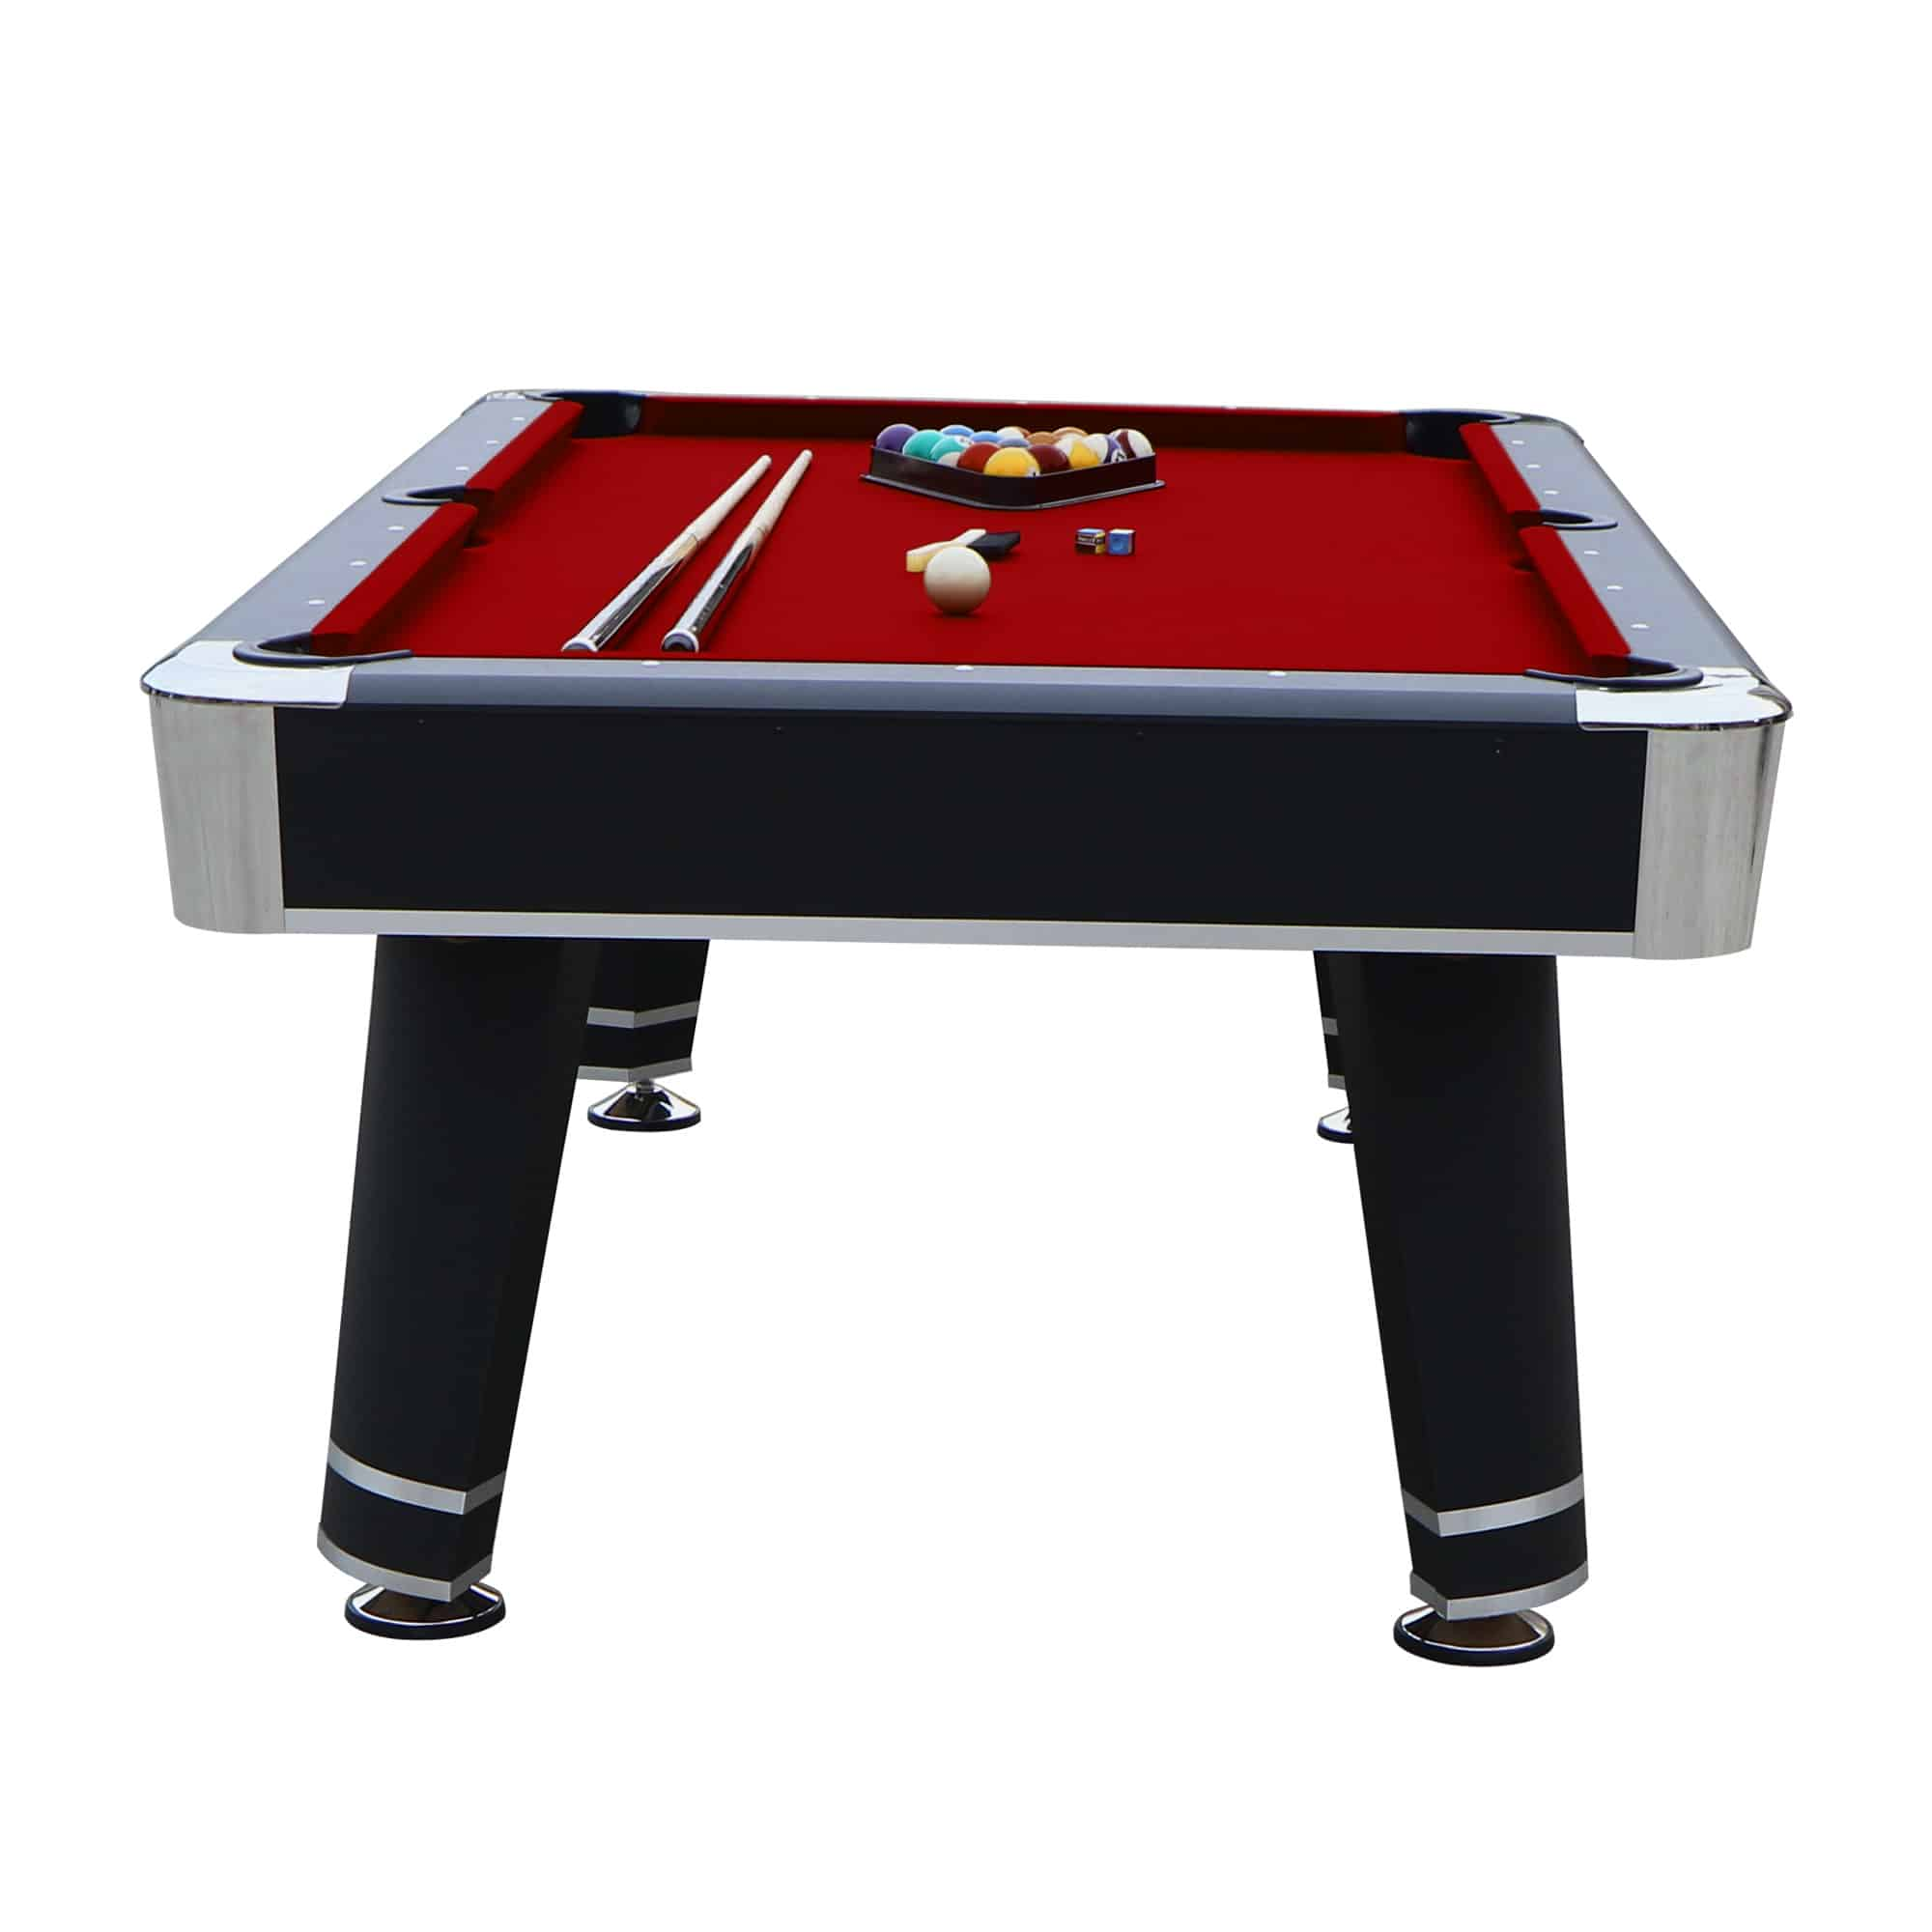 Jupiter 7-ft Pool Table